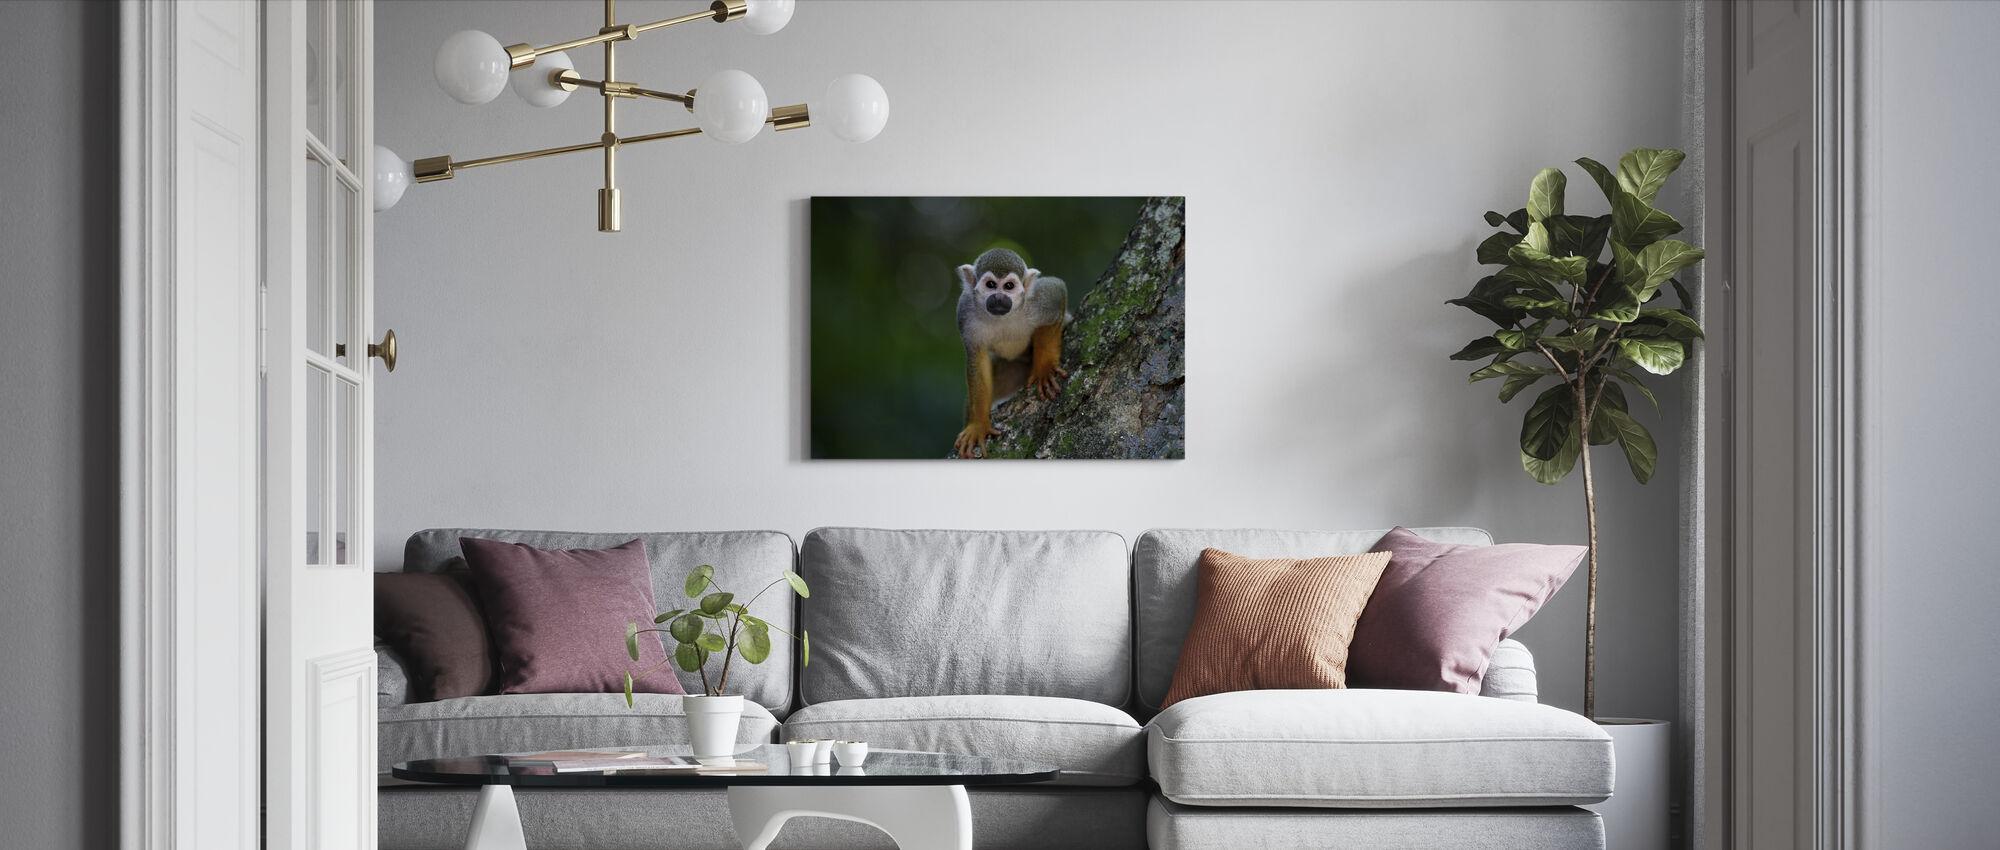 Tuoksuva apina - Canvastaulu - Olohuone